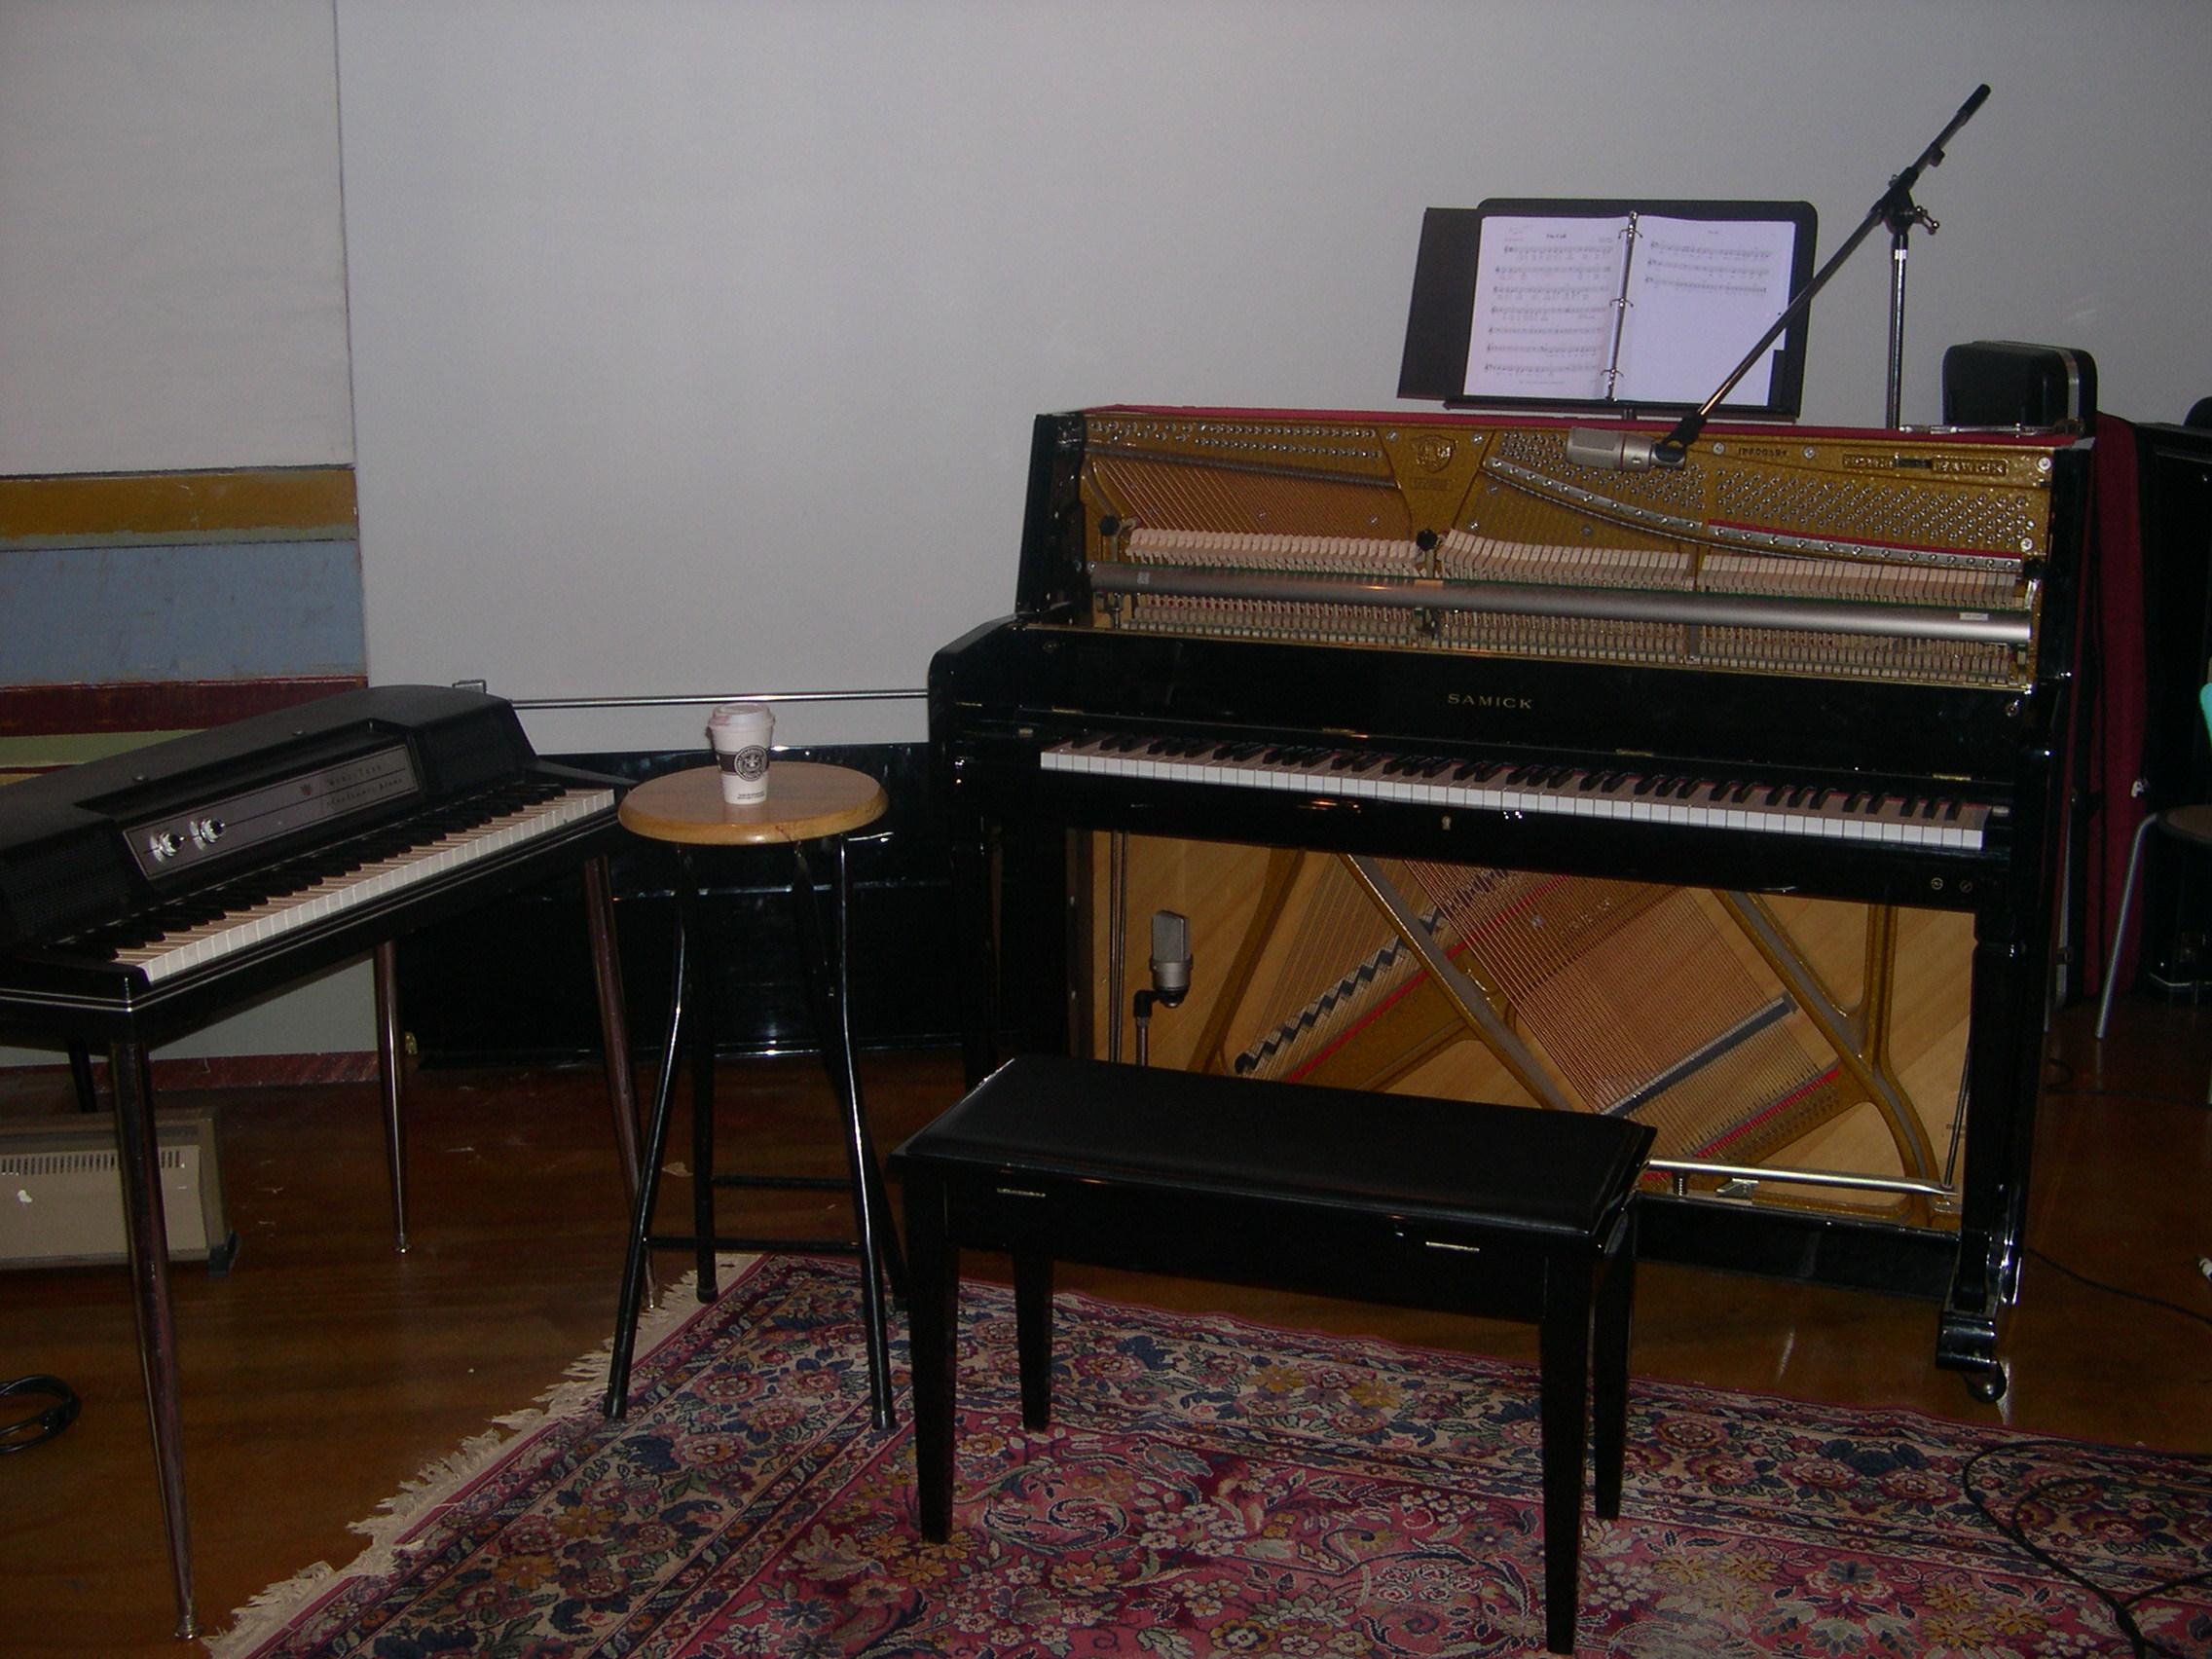 Wurlitzer piano dimensions images for Dimensions of a piano